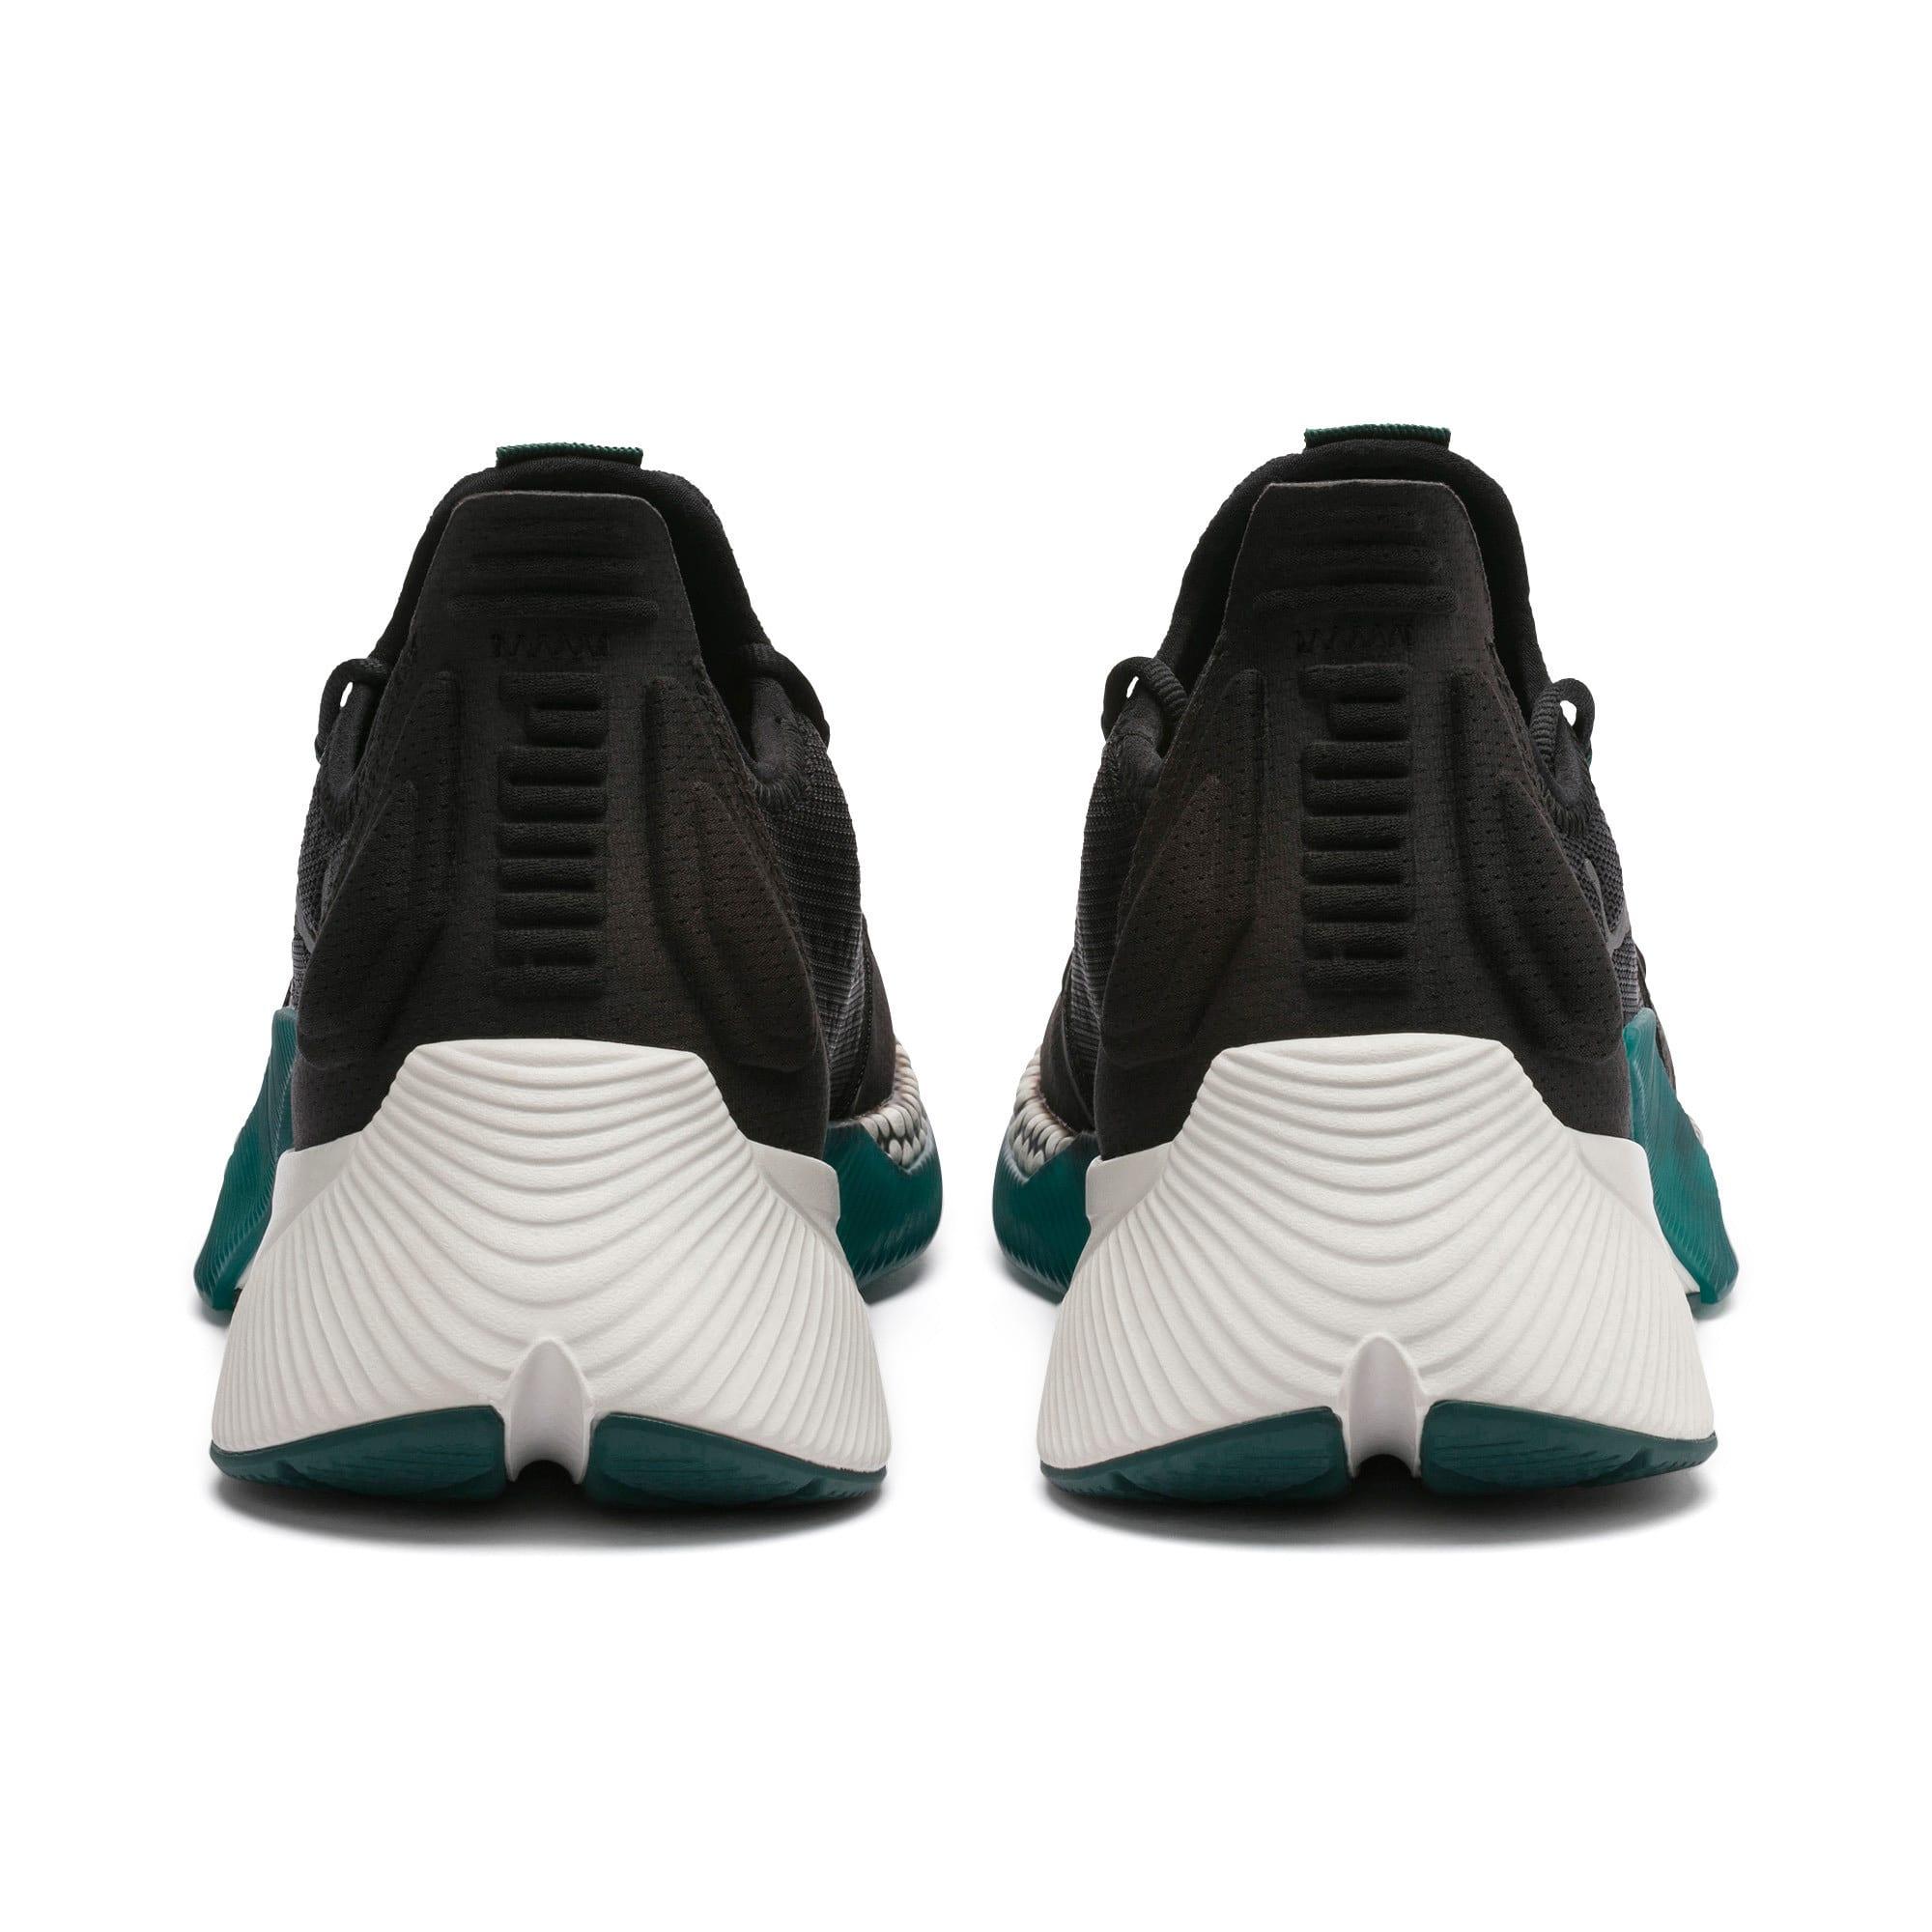 Thumbnail 4 of Xcelerator Men's Sneakers, Black-Glacier Gray-Ponderosa, medium